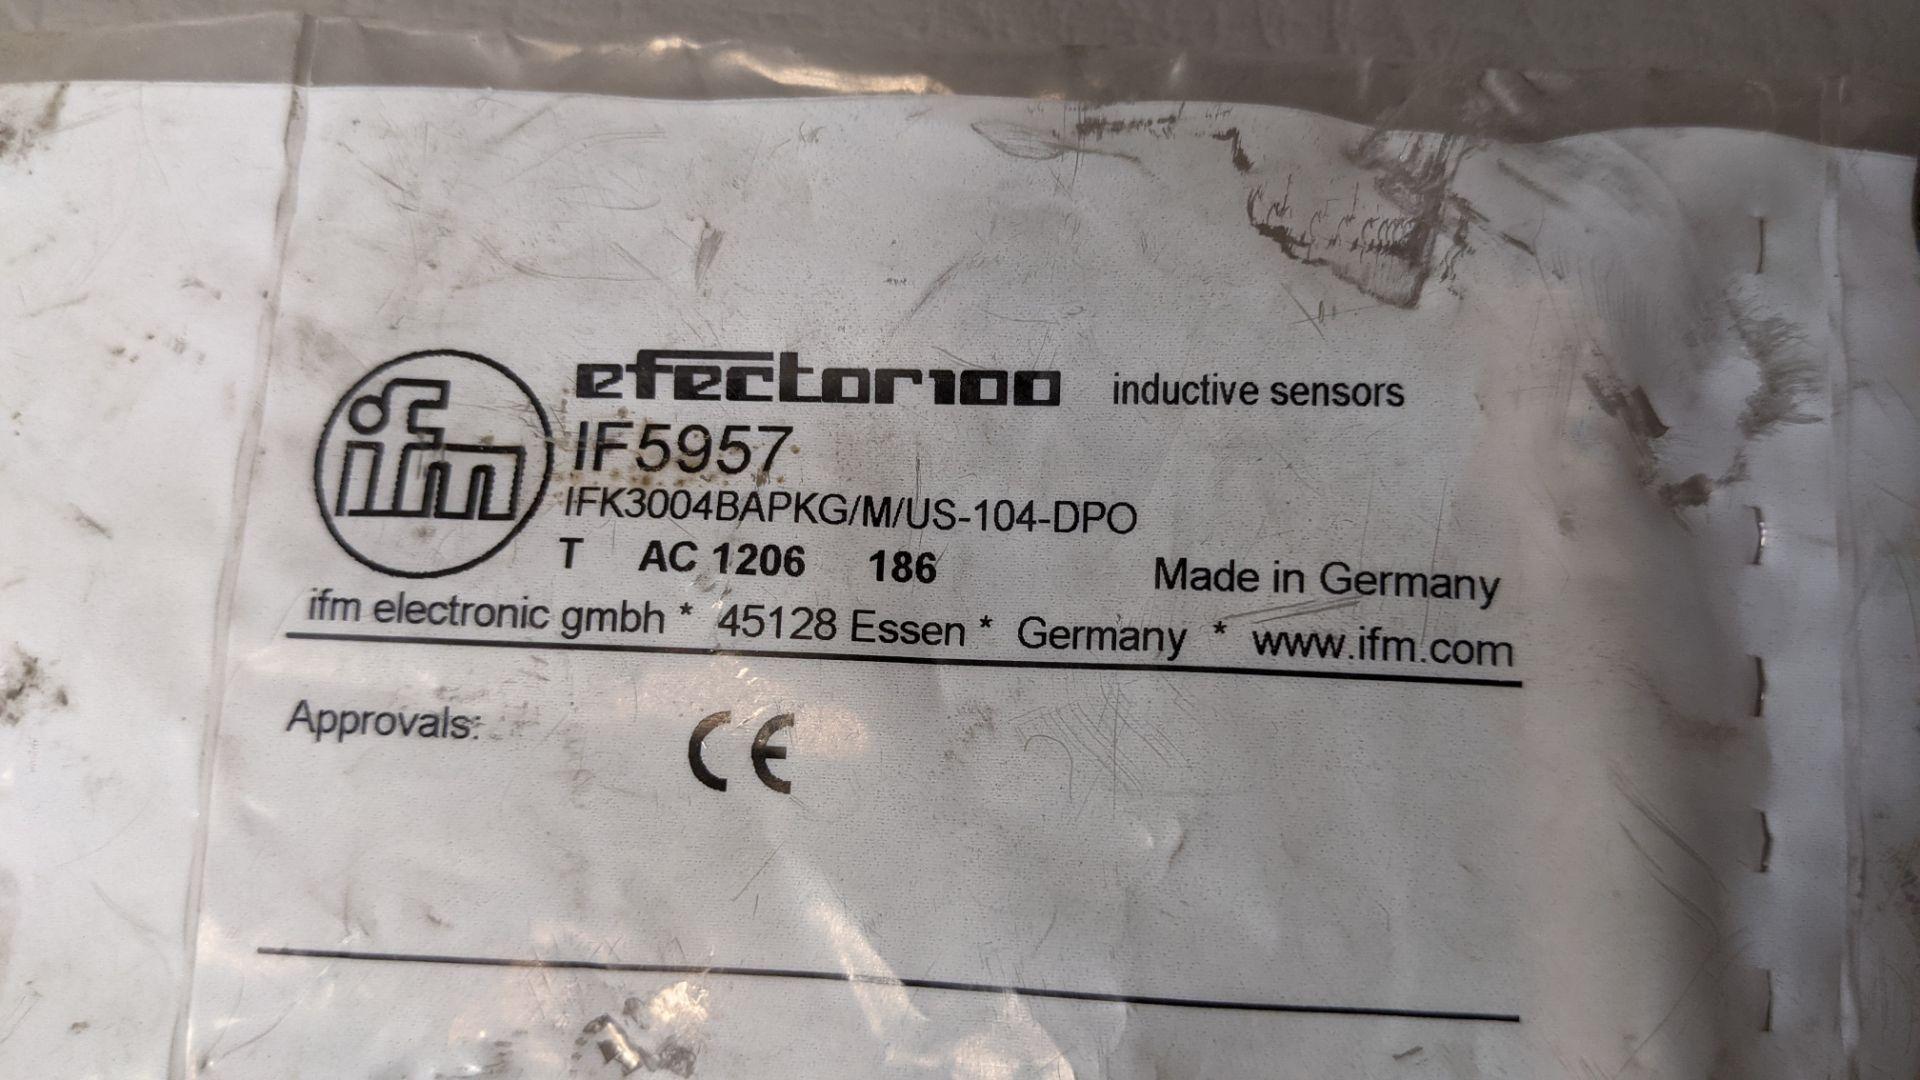 NEW IFM EFECTOR PROXIMITY SENSOR - Image 2 of 2